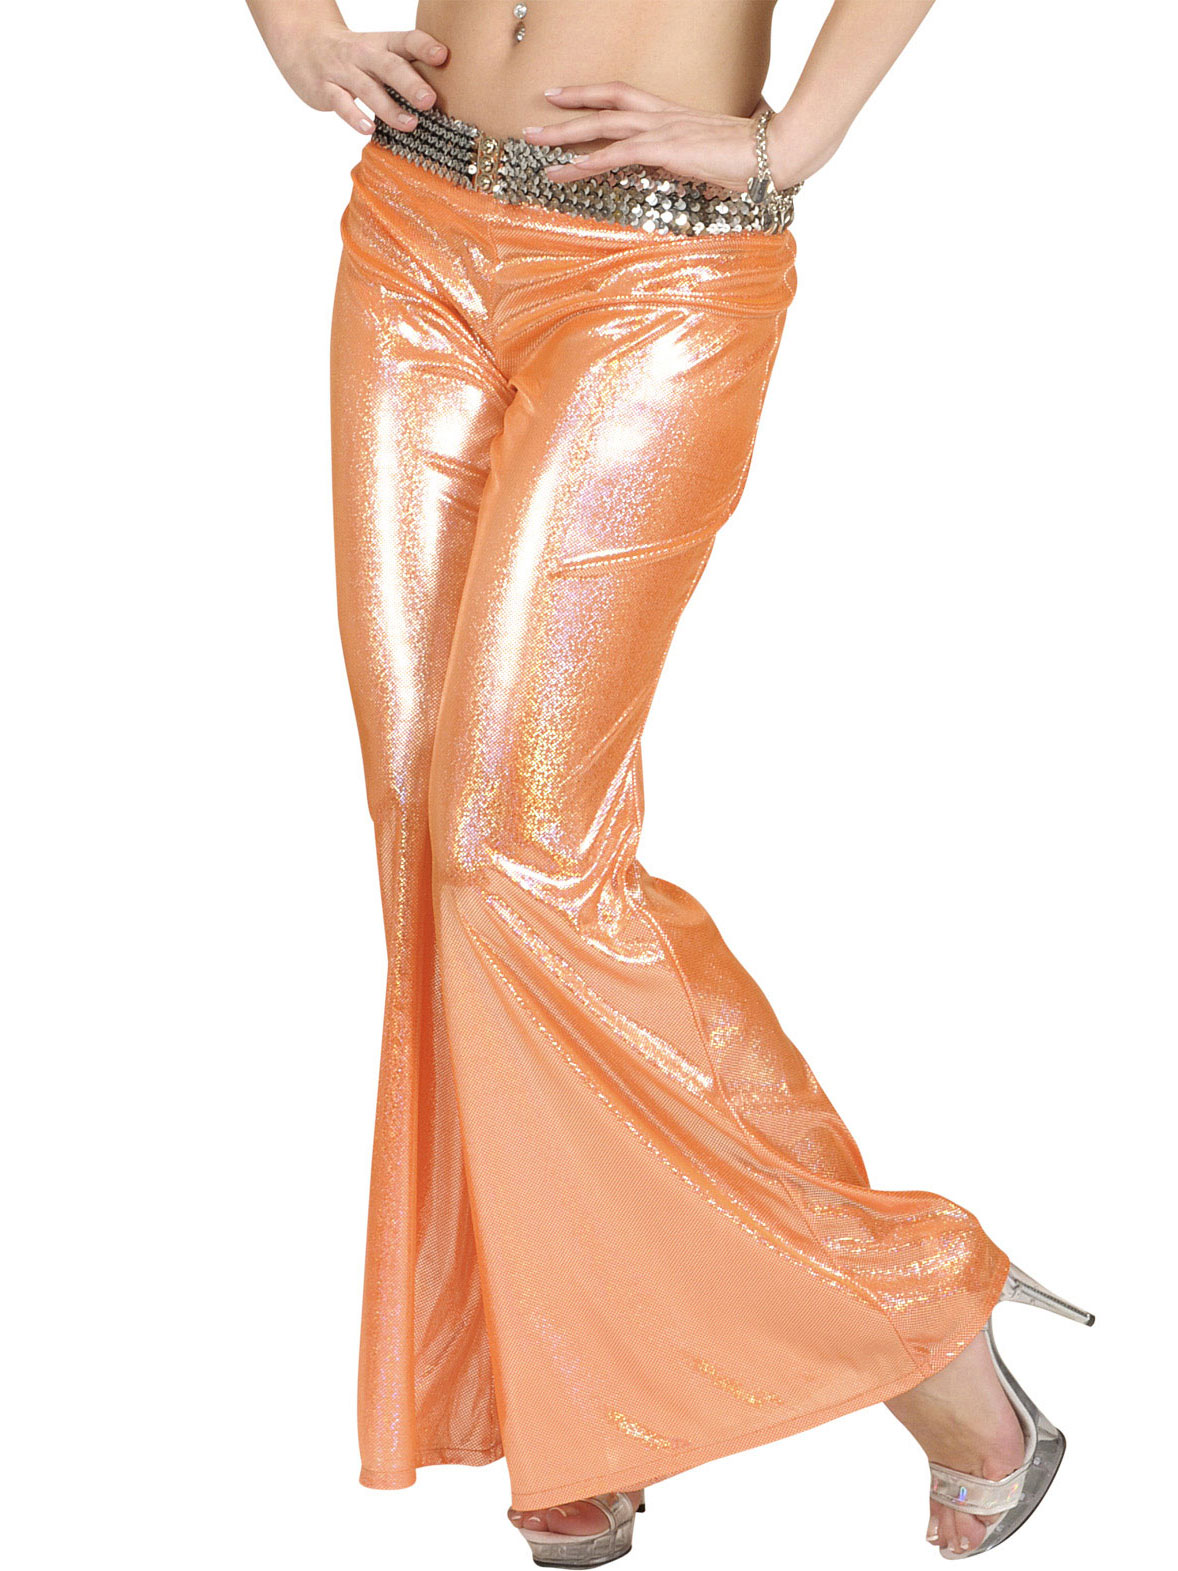 holografische discohose orange f r damen kost me f r erwachsene und g nstige faschingskost me. Black Bedroom Furniture Sets. Home Design Ideas